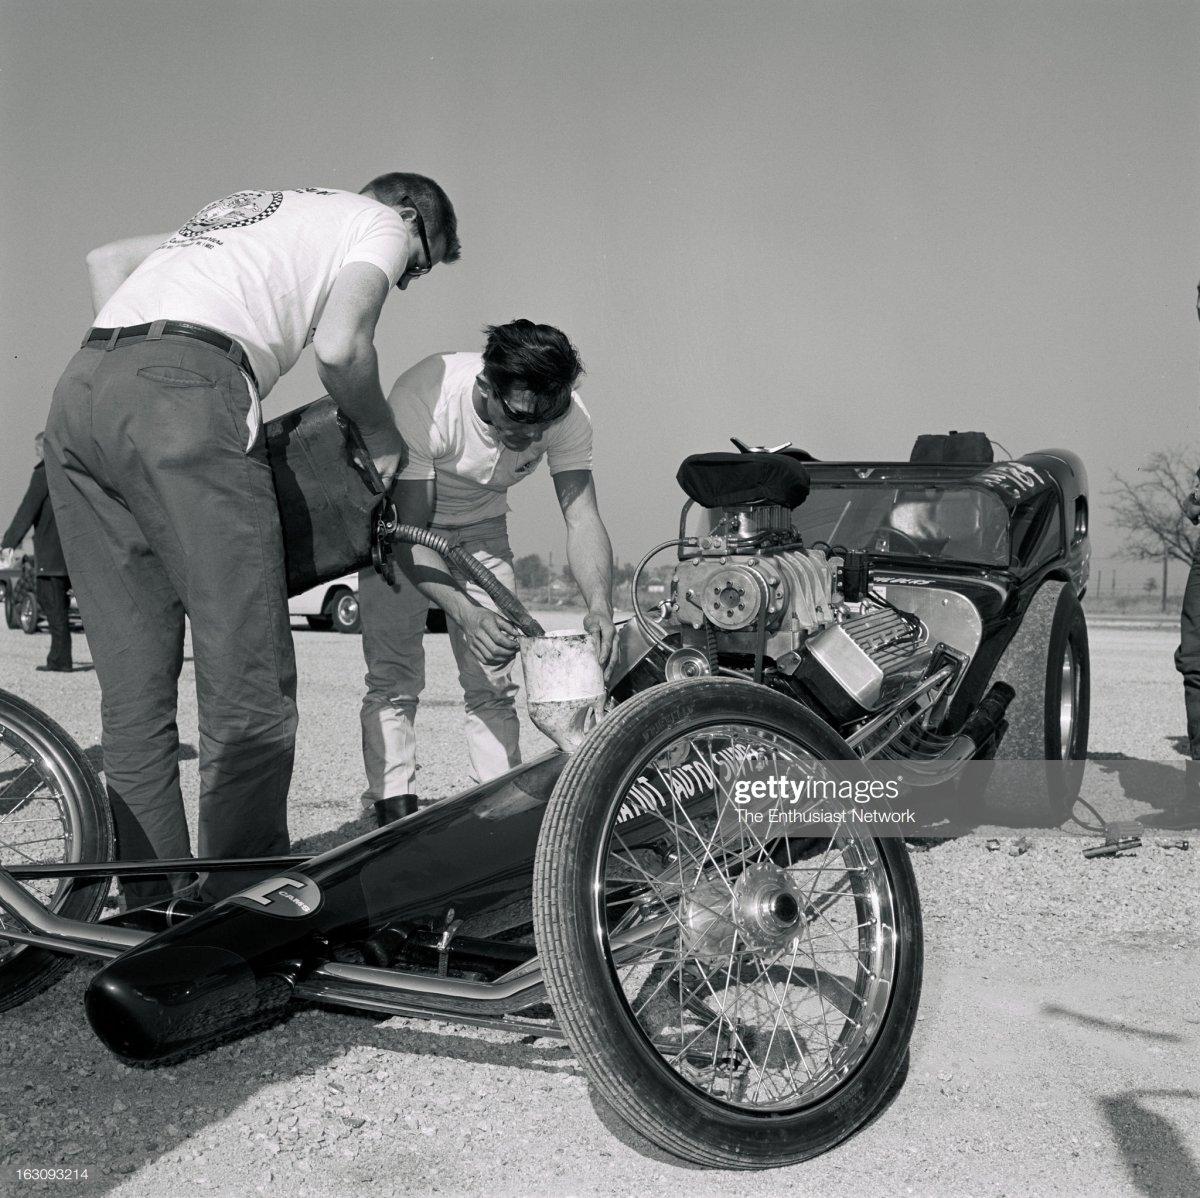 1comp 1965 NHRA World Championship and T.jpg